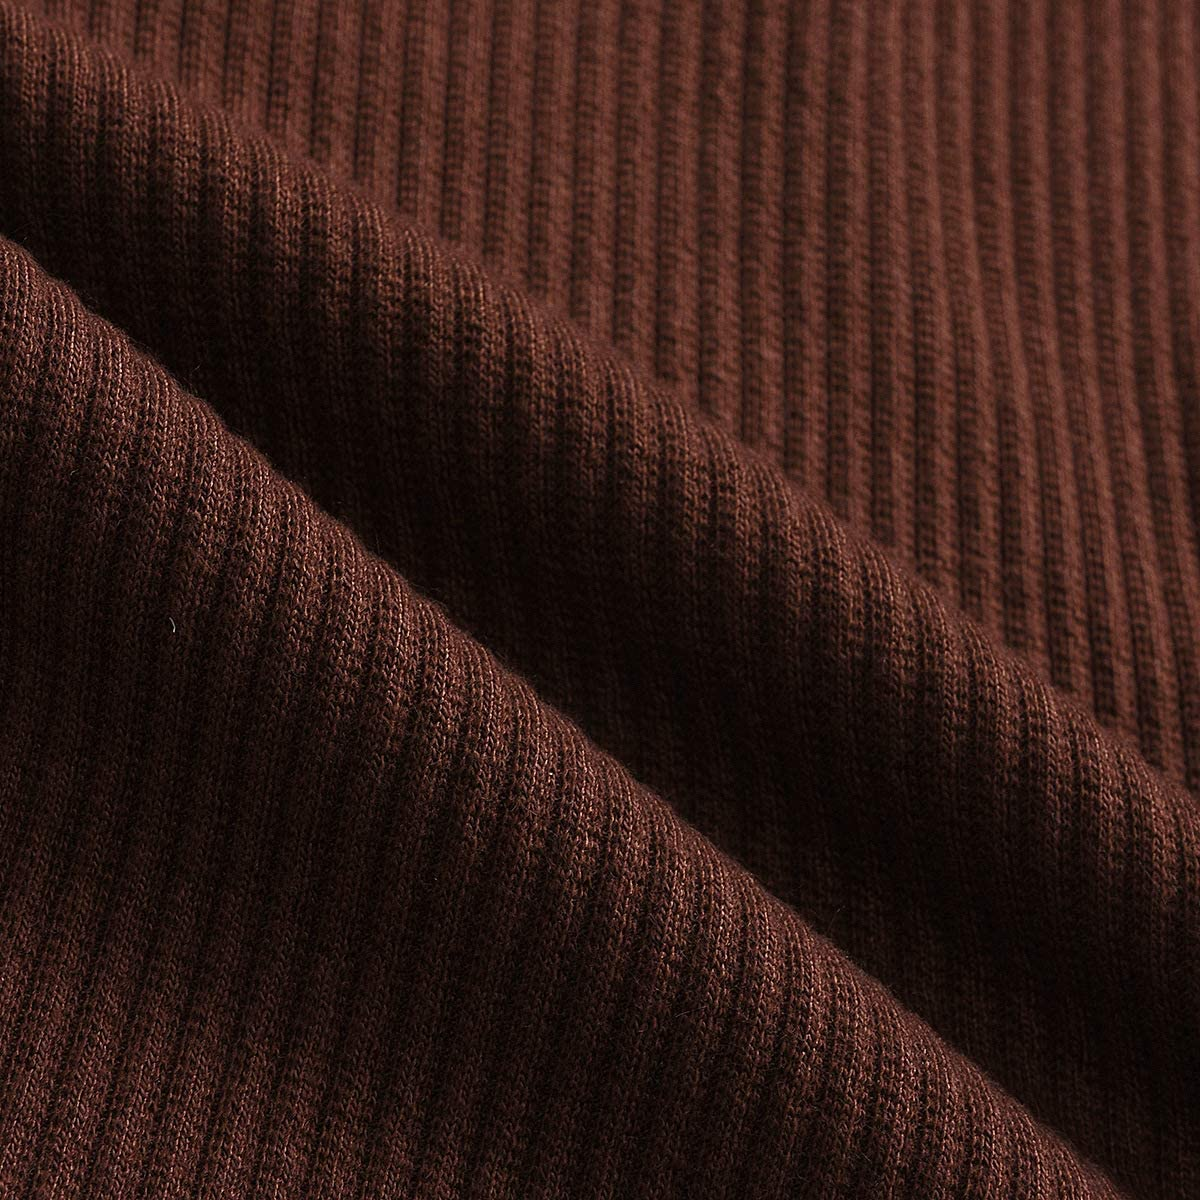 6M-3Y Baby Kids Summer Set Unisex Girls Pjs /& Boys Soft Comfy Cotton Elastic Ribbed Loungewear Lounge suit Sleepwear 2pcs Clothes Snug Fit Plain Dyed Solid Color Outfit